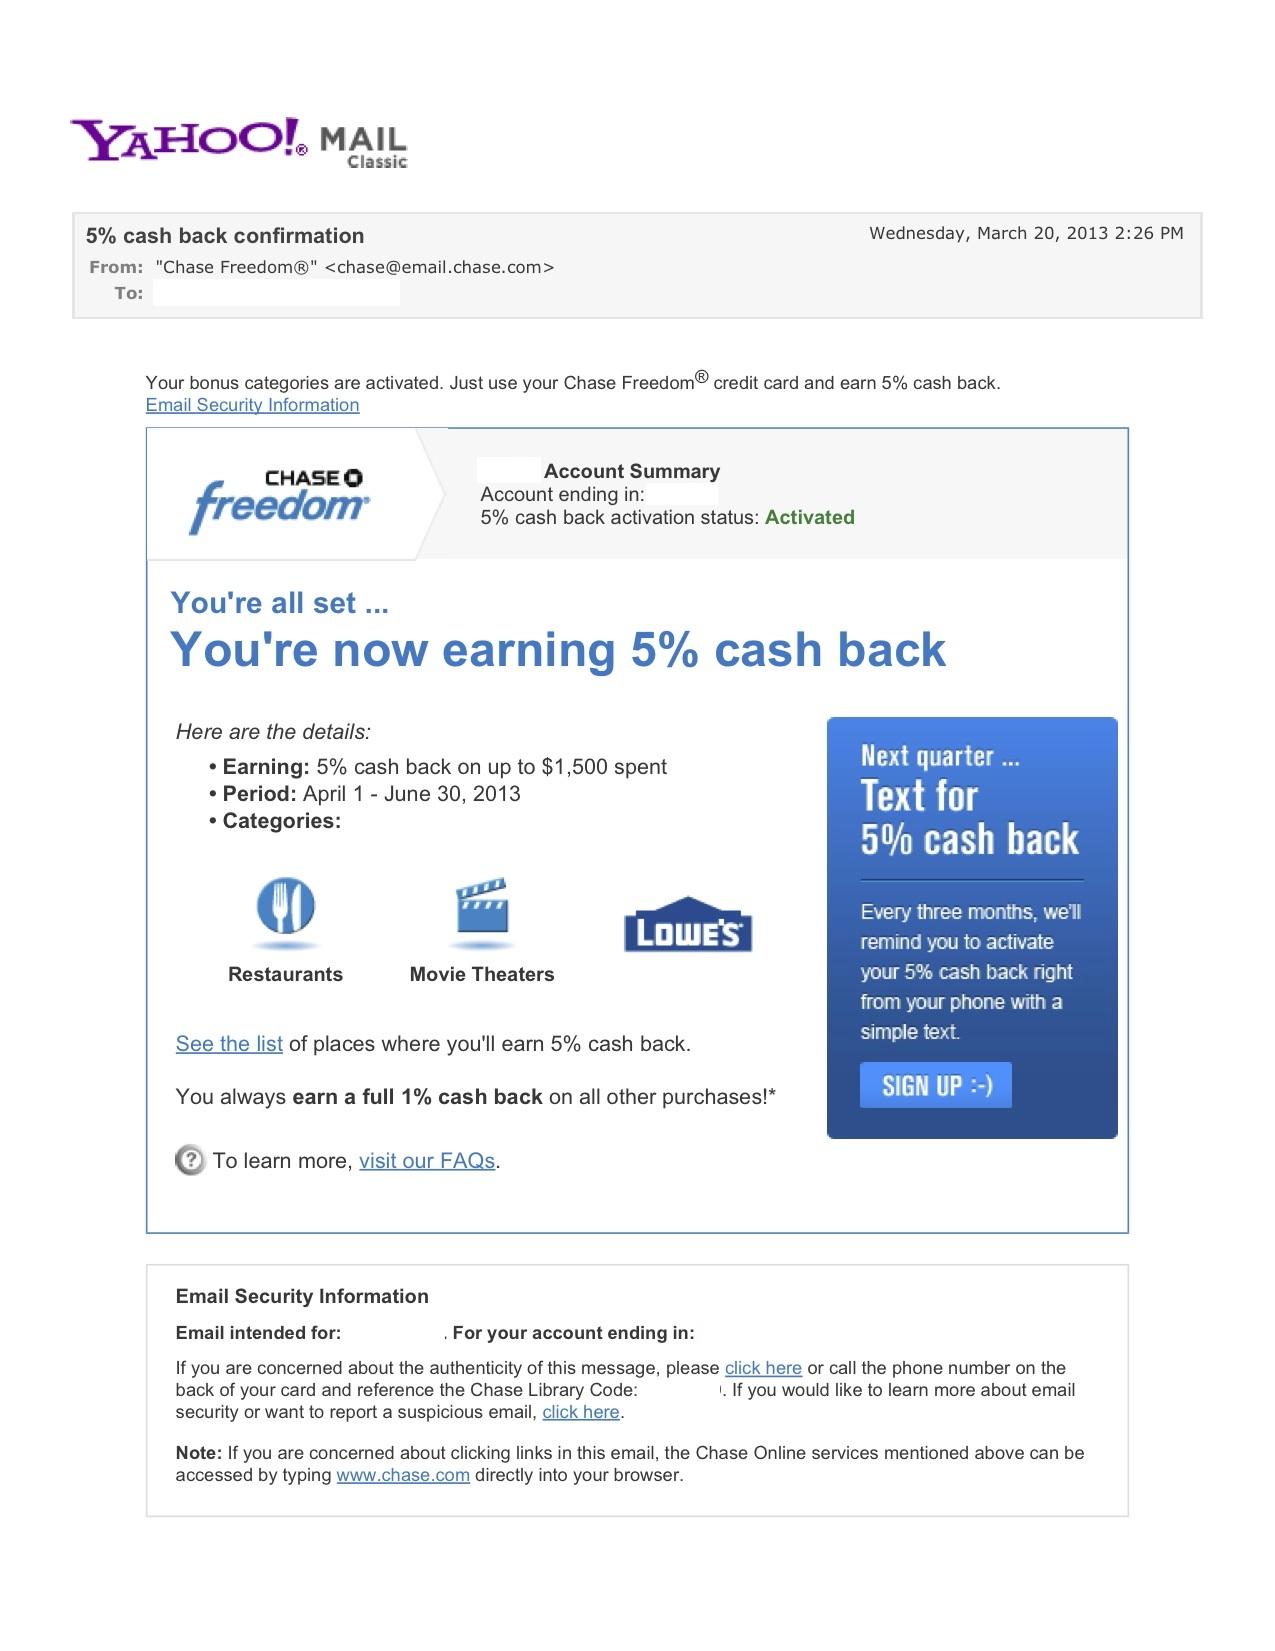 5% cash back confirmation - Yahoo! Mail.jpg